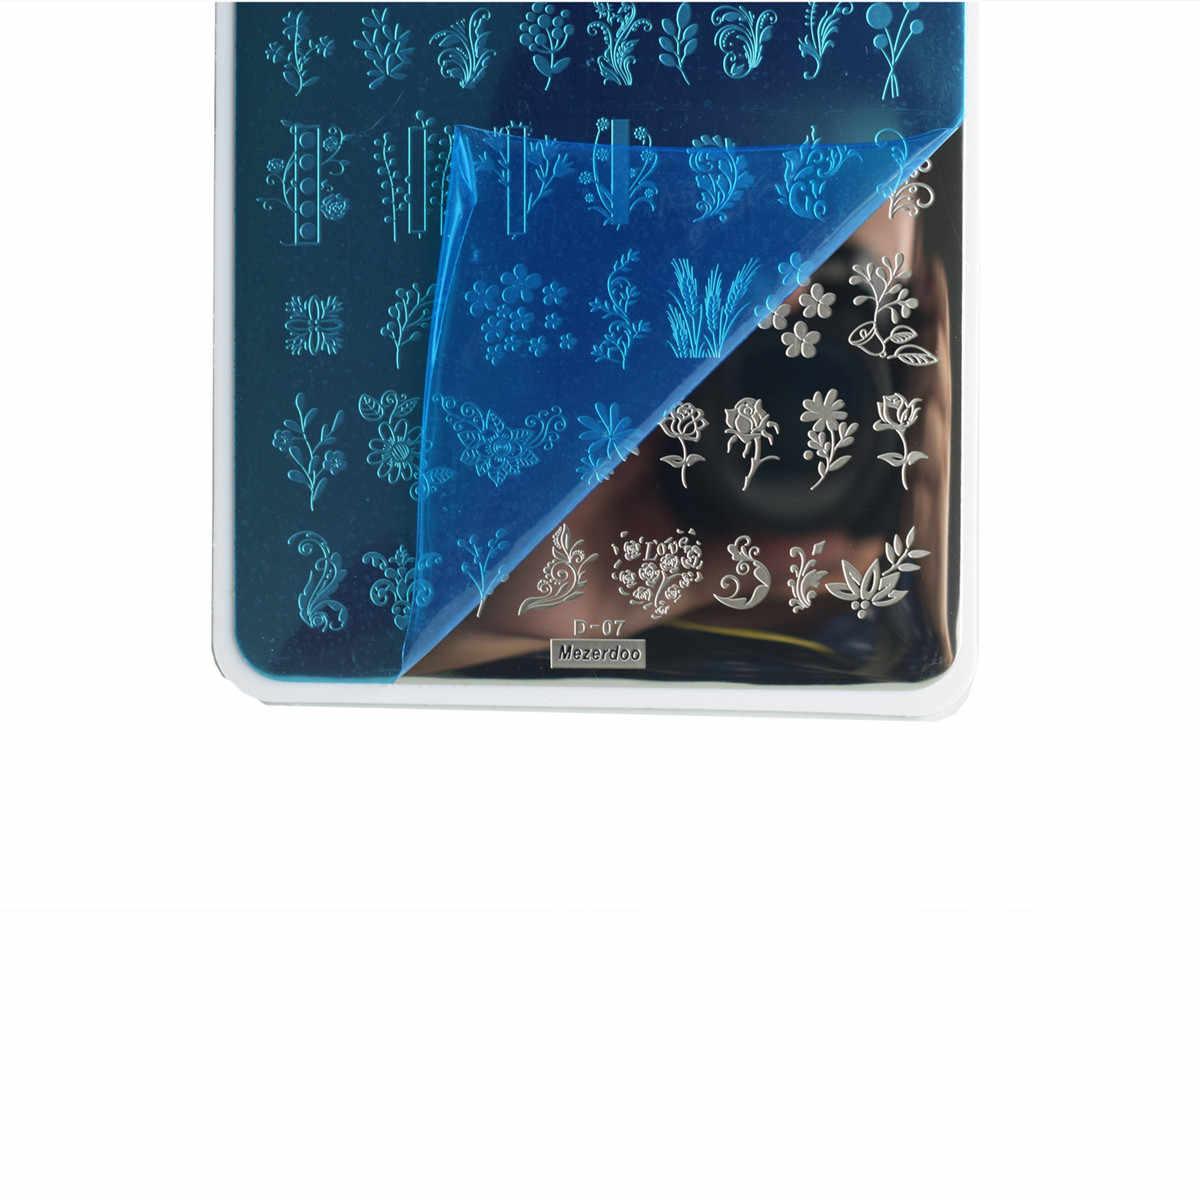 1 Pc แผ่นปั๊มเล็บดอกไม้เรขาคณิต Nature Series เล็บแม่แบบแสตมป์ภาพเล็บแสตมป์แผ่นลายฉลุเล็บเครื่องมือ d07